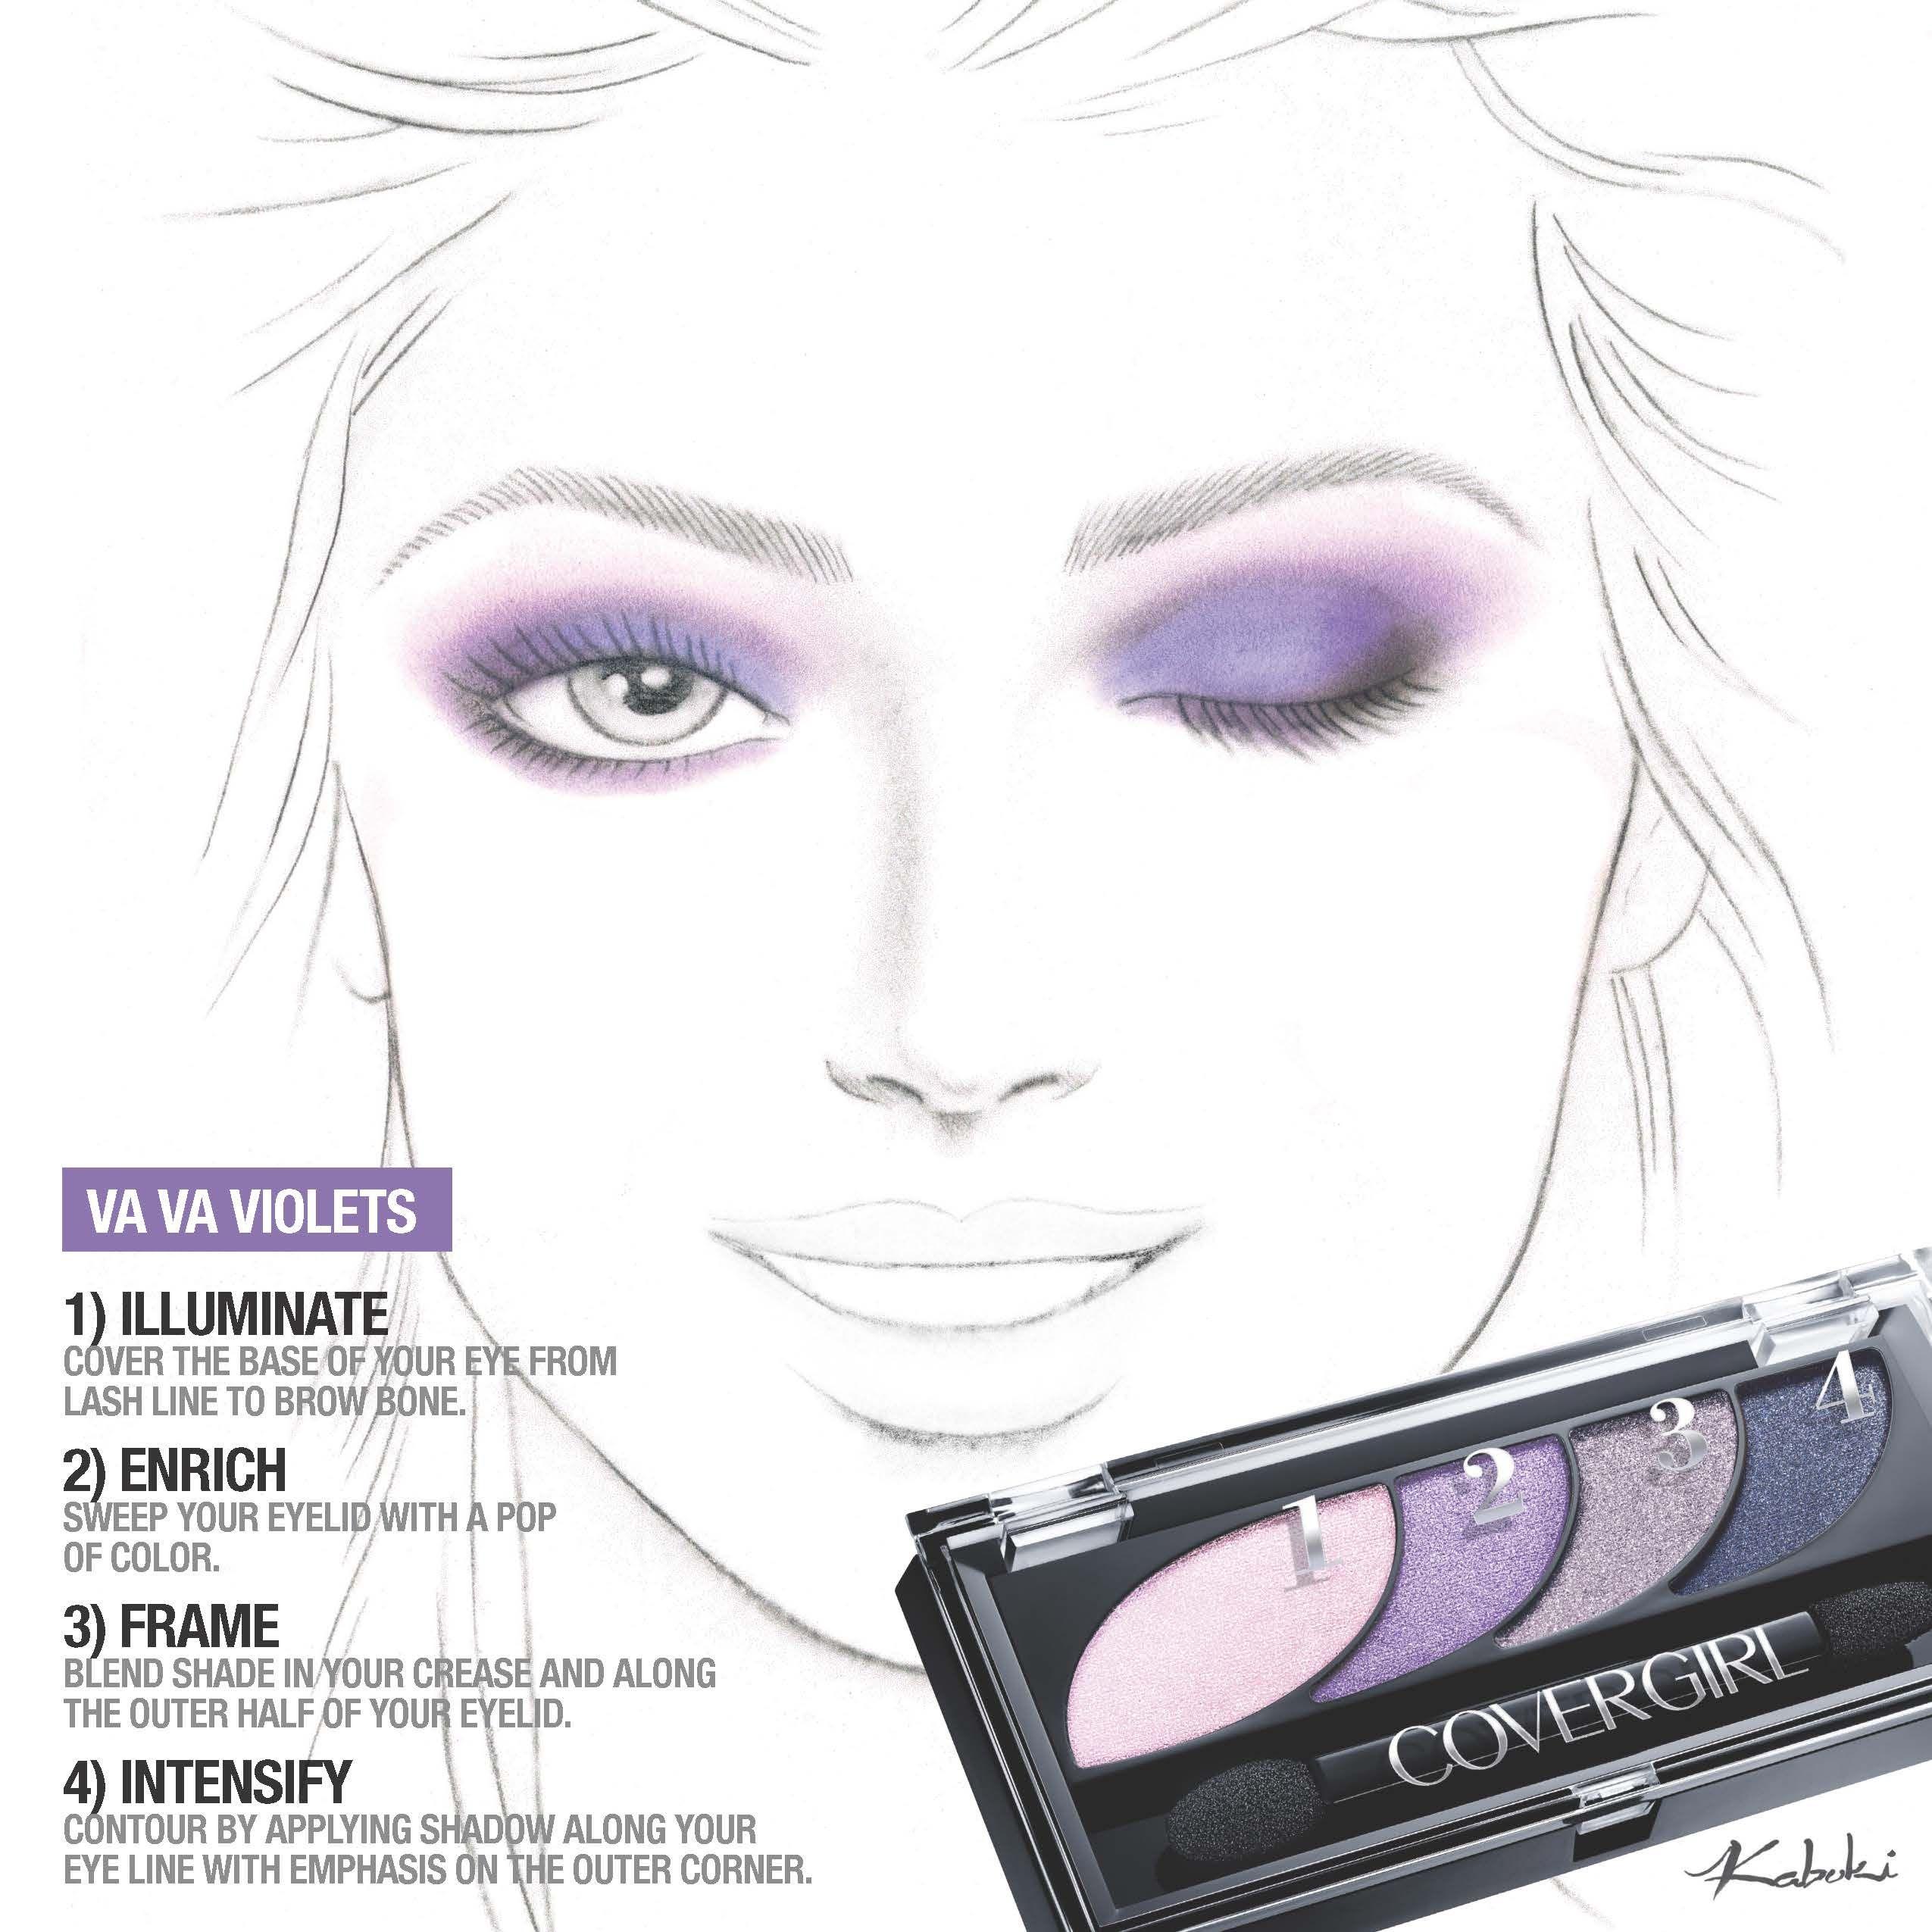 Purple Smoke Eye Shadow Howto: From Light Lavender To Deep Purple Smolder,